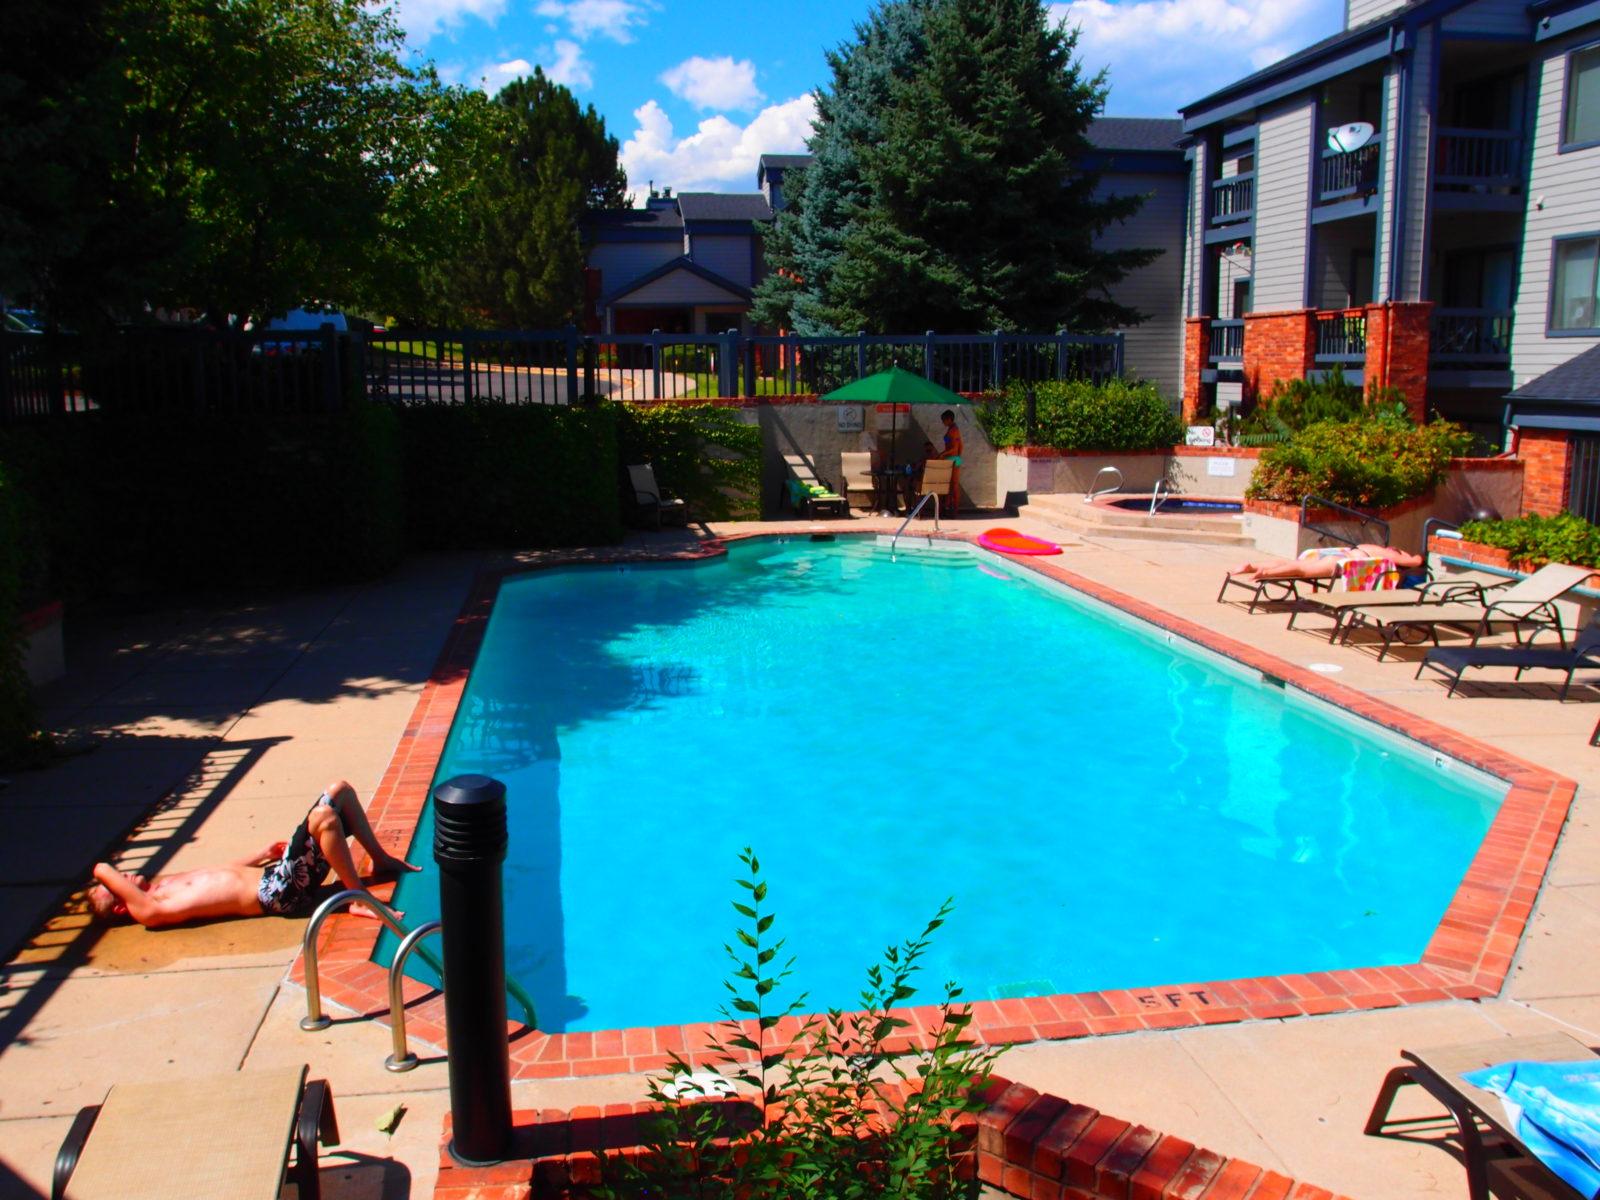 Trout Farm pool